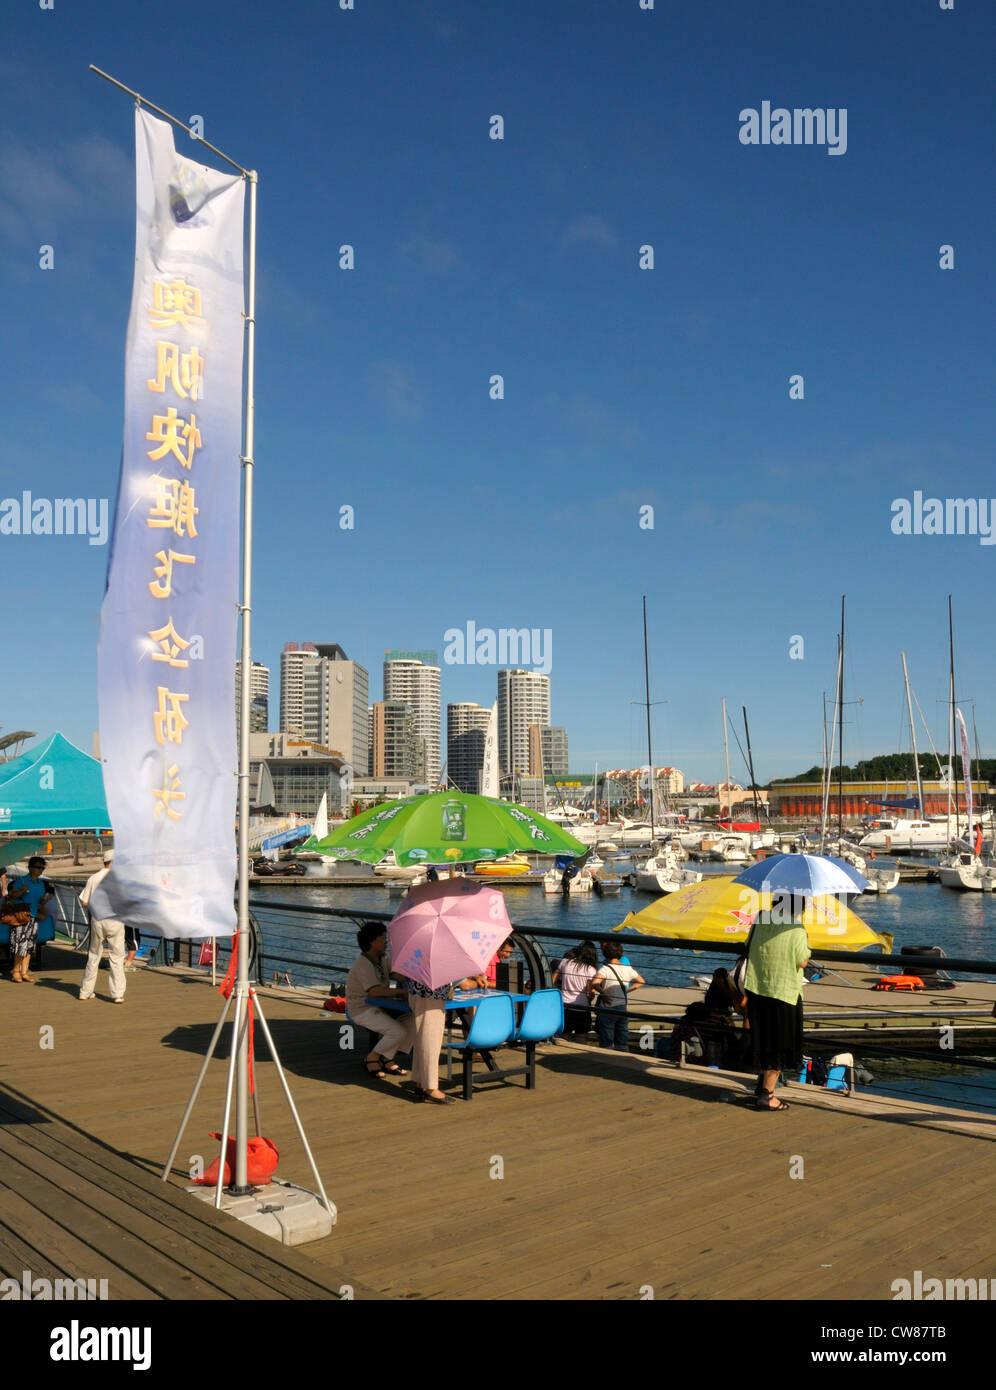 People picnicking in Qingdao marina. - Stock Image